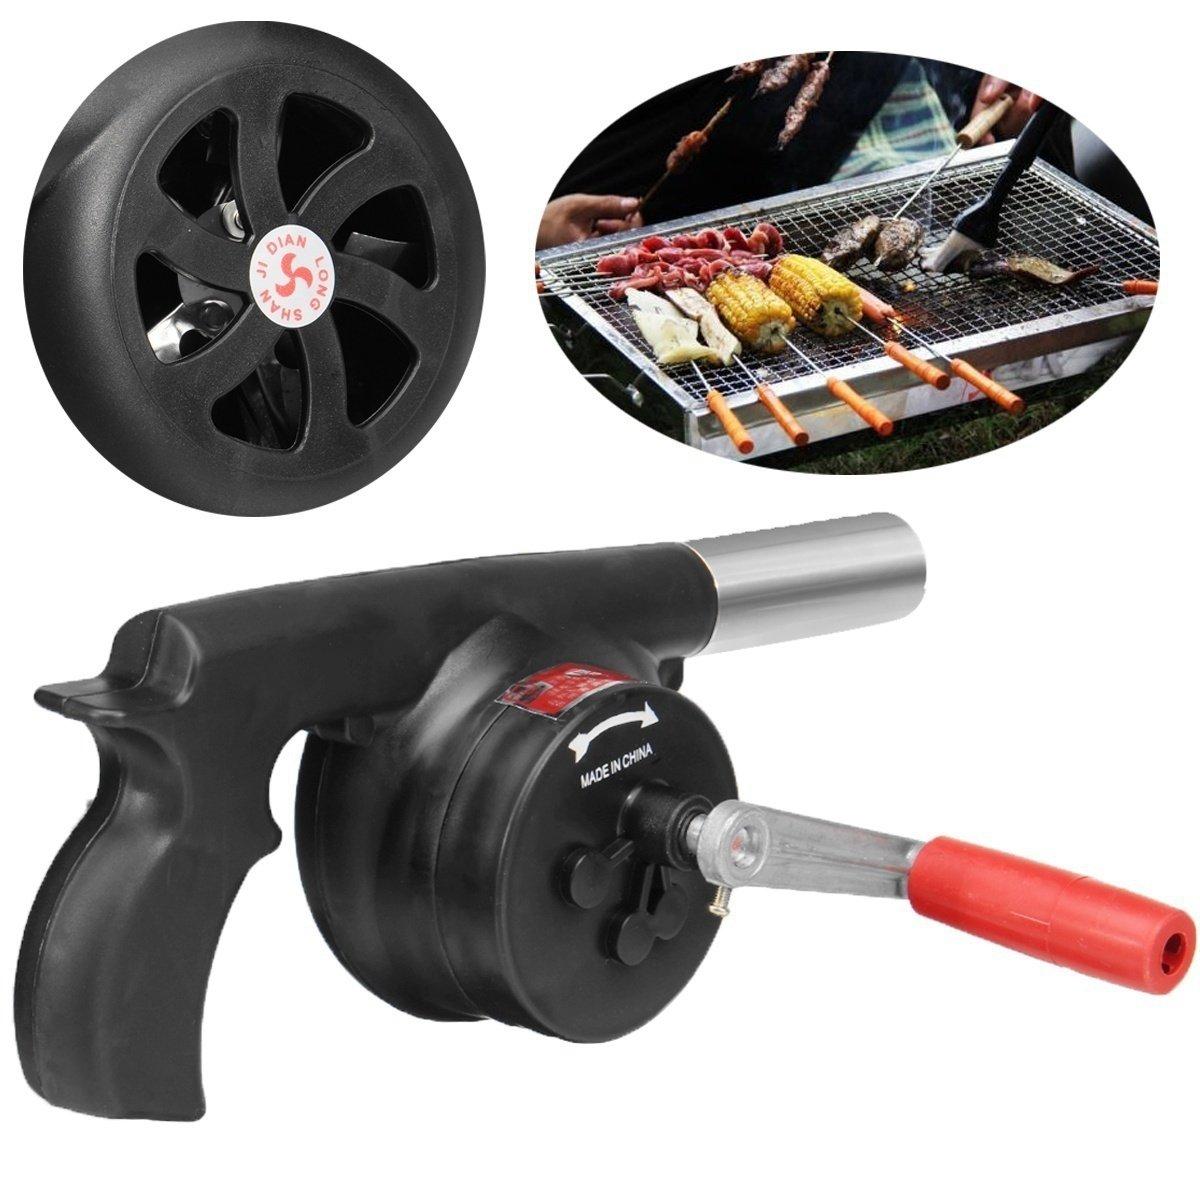 Manuelle Luftgebläse Handkurbel Kochen Grill Fan für Barbecue Feuer Kunststoff